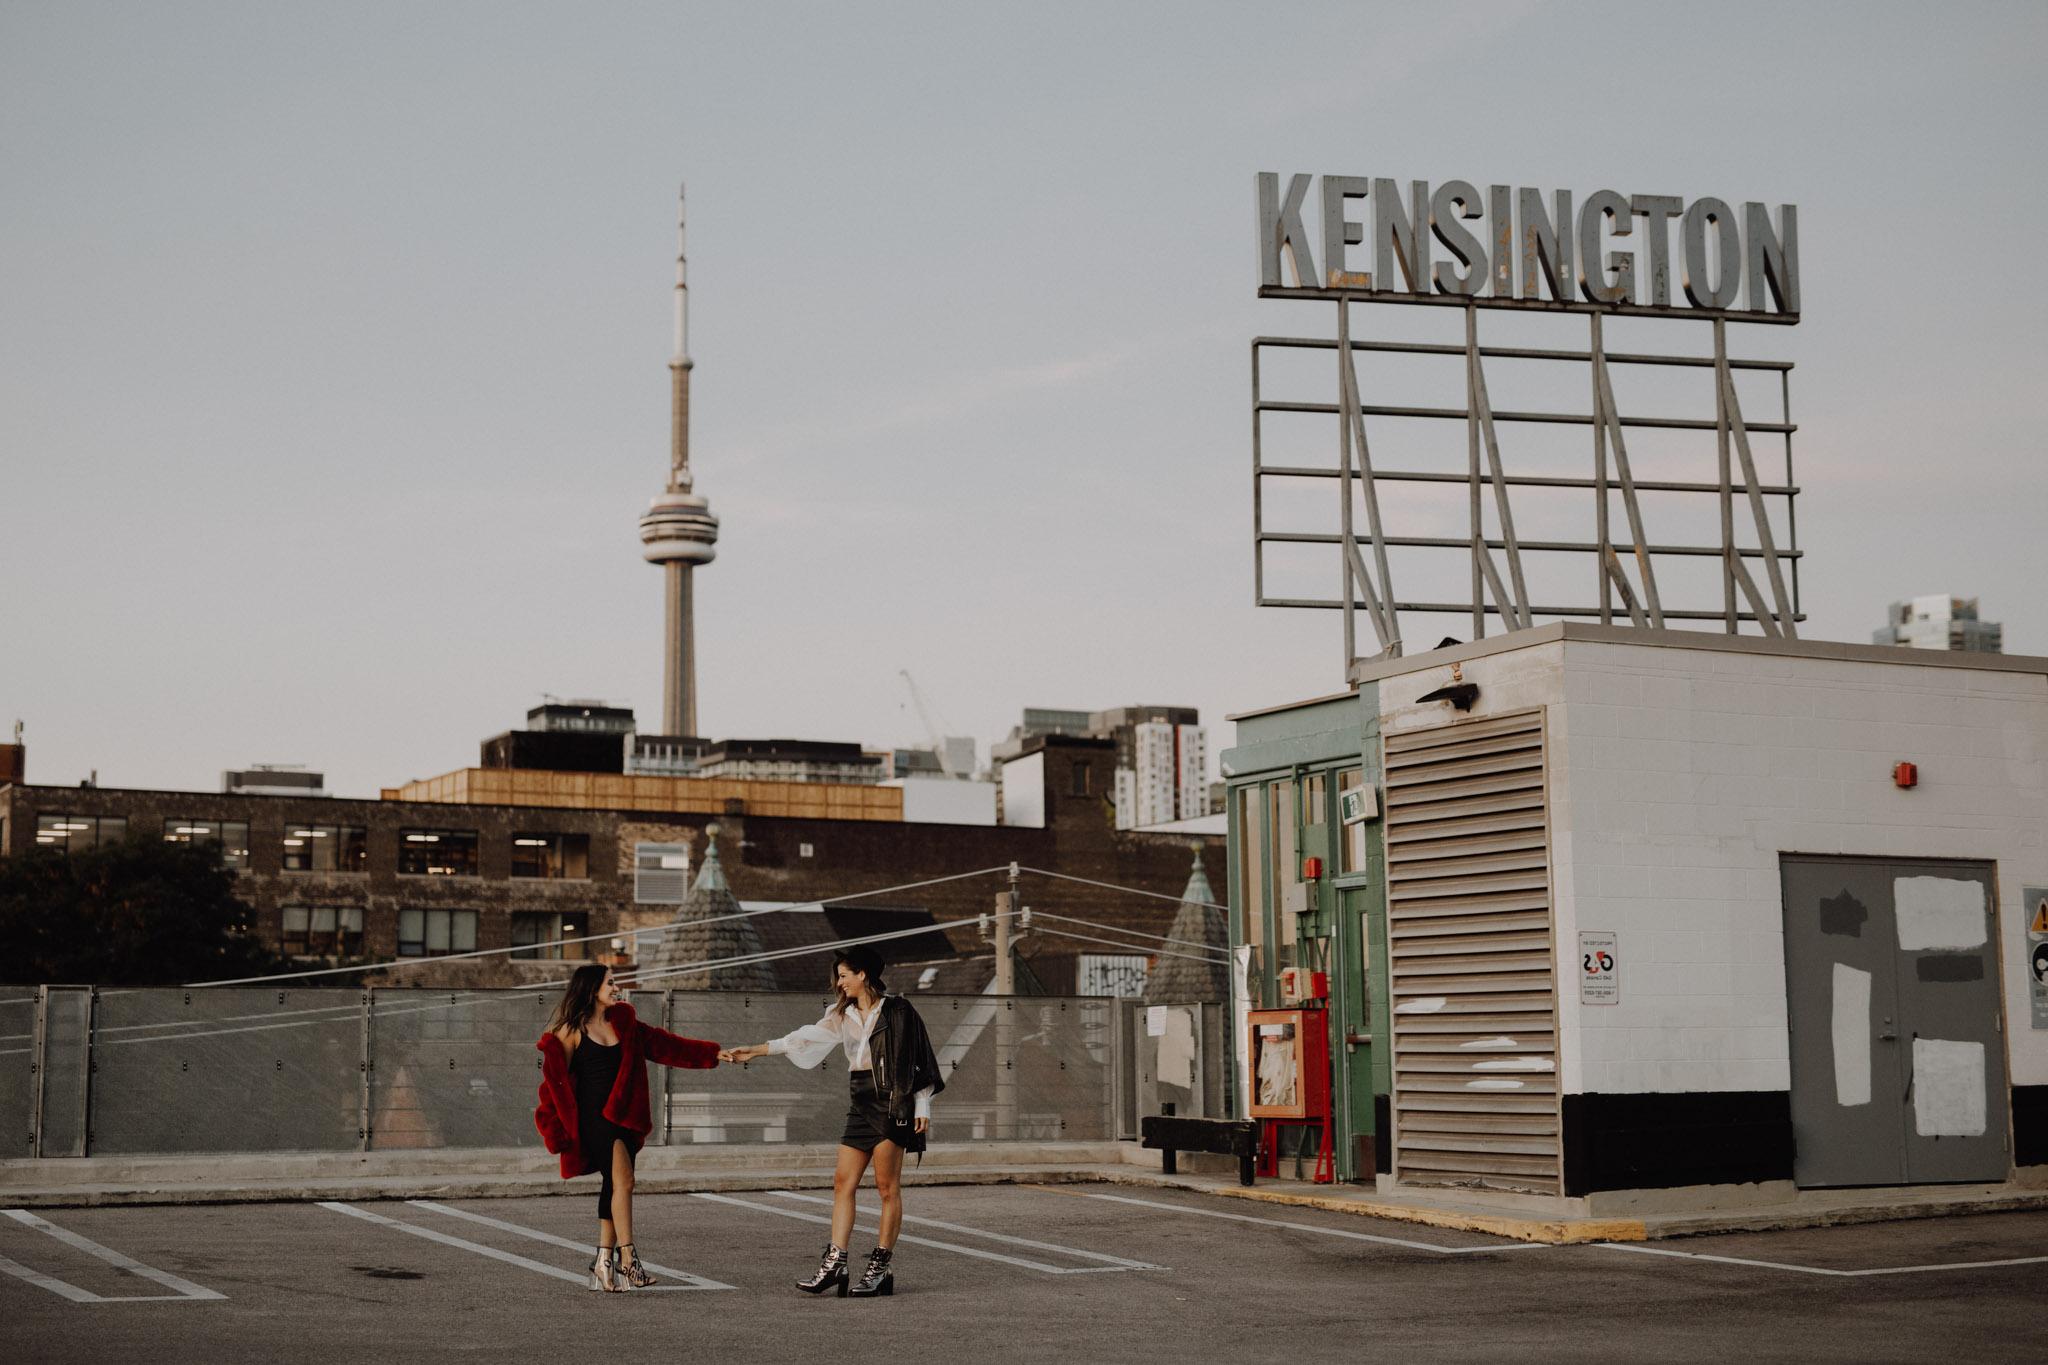 Toronto LGBTQ Engagement Photographer - kensington roof top engagement